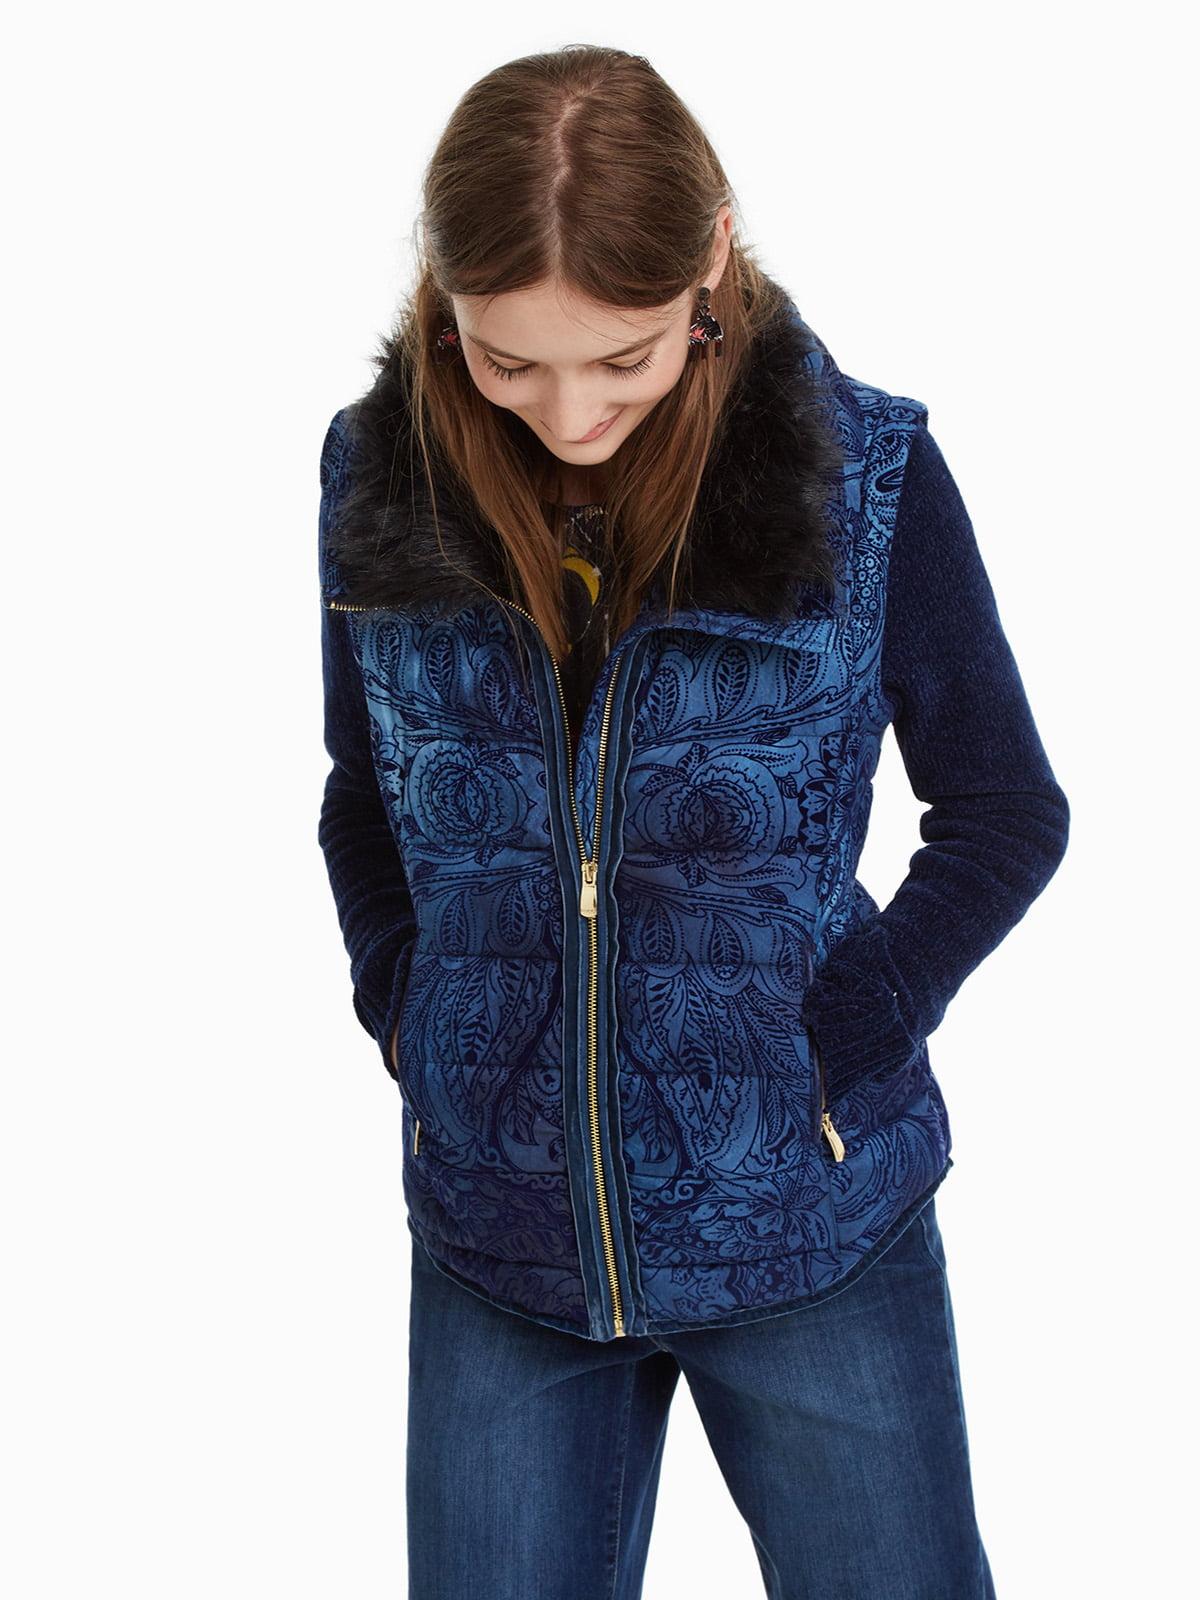 Куртка синя з принтом | 4524254 | фото 2